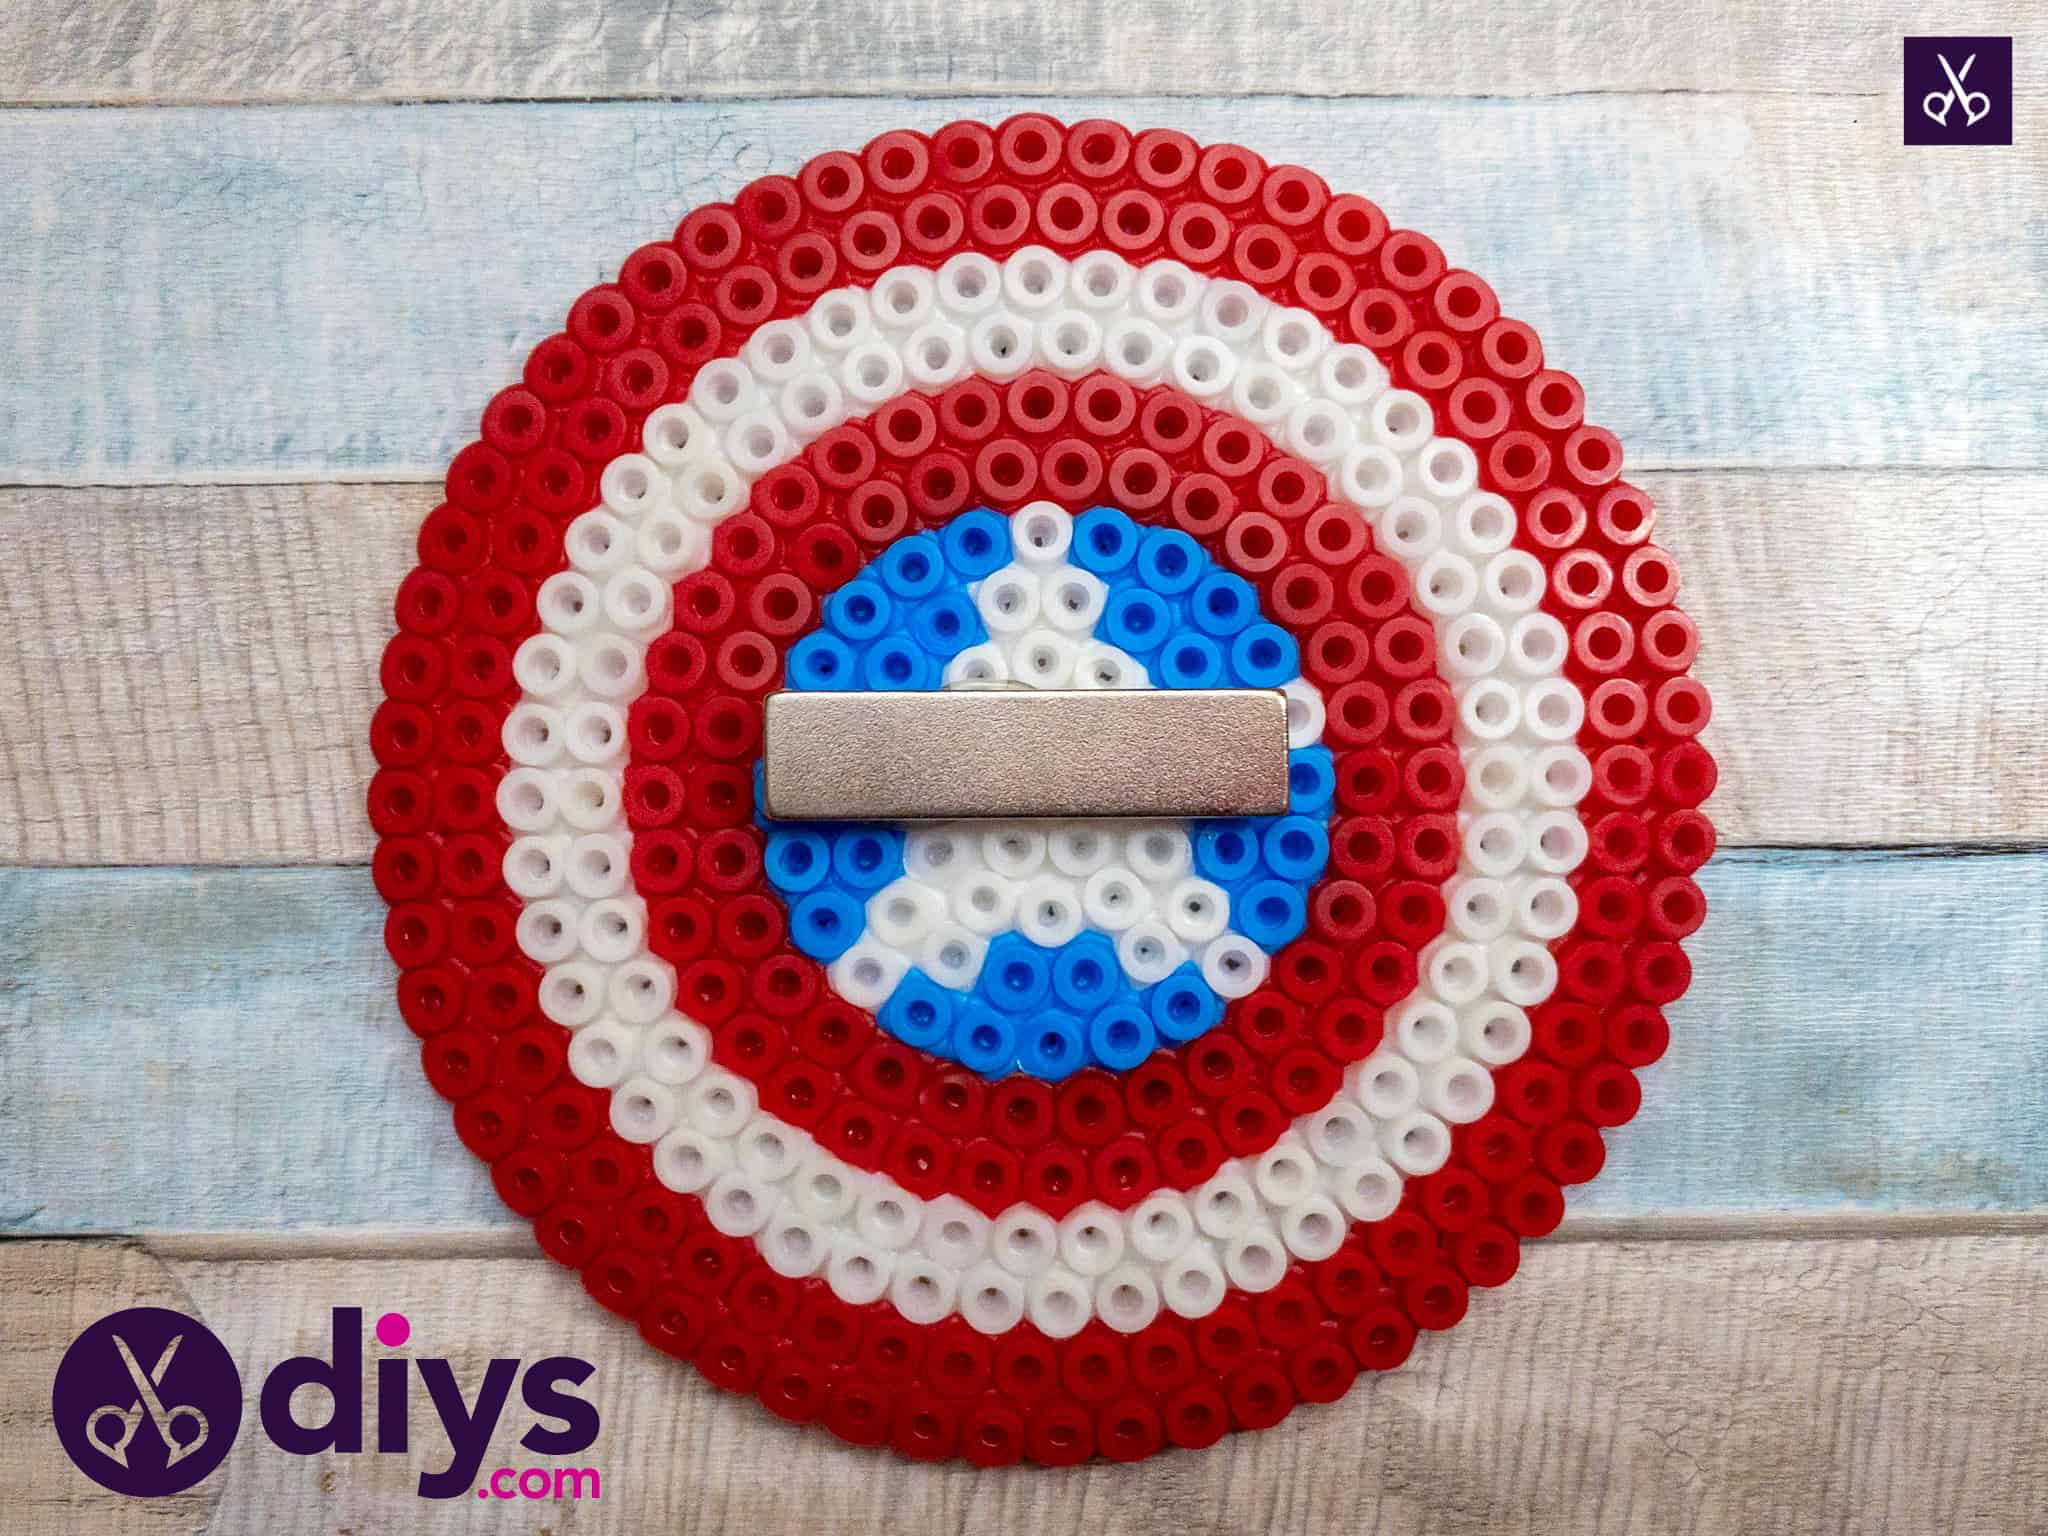 How to make a cool captain america freezer magnet diy